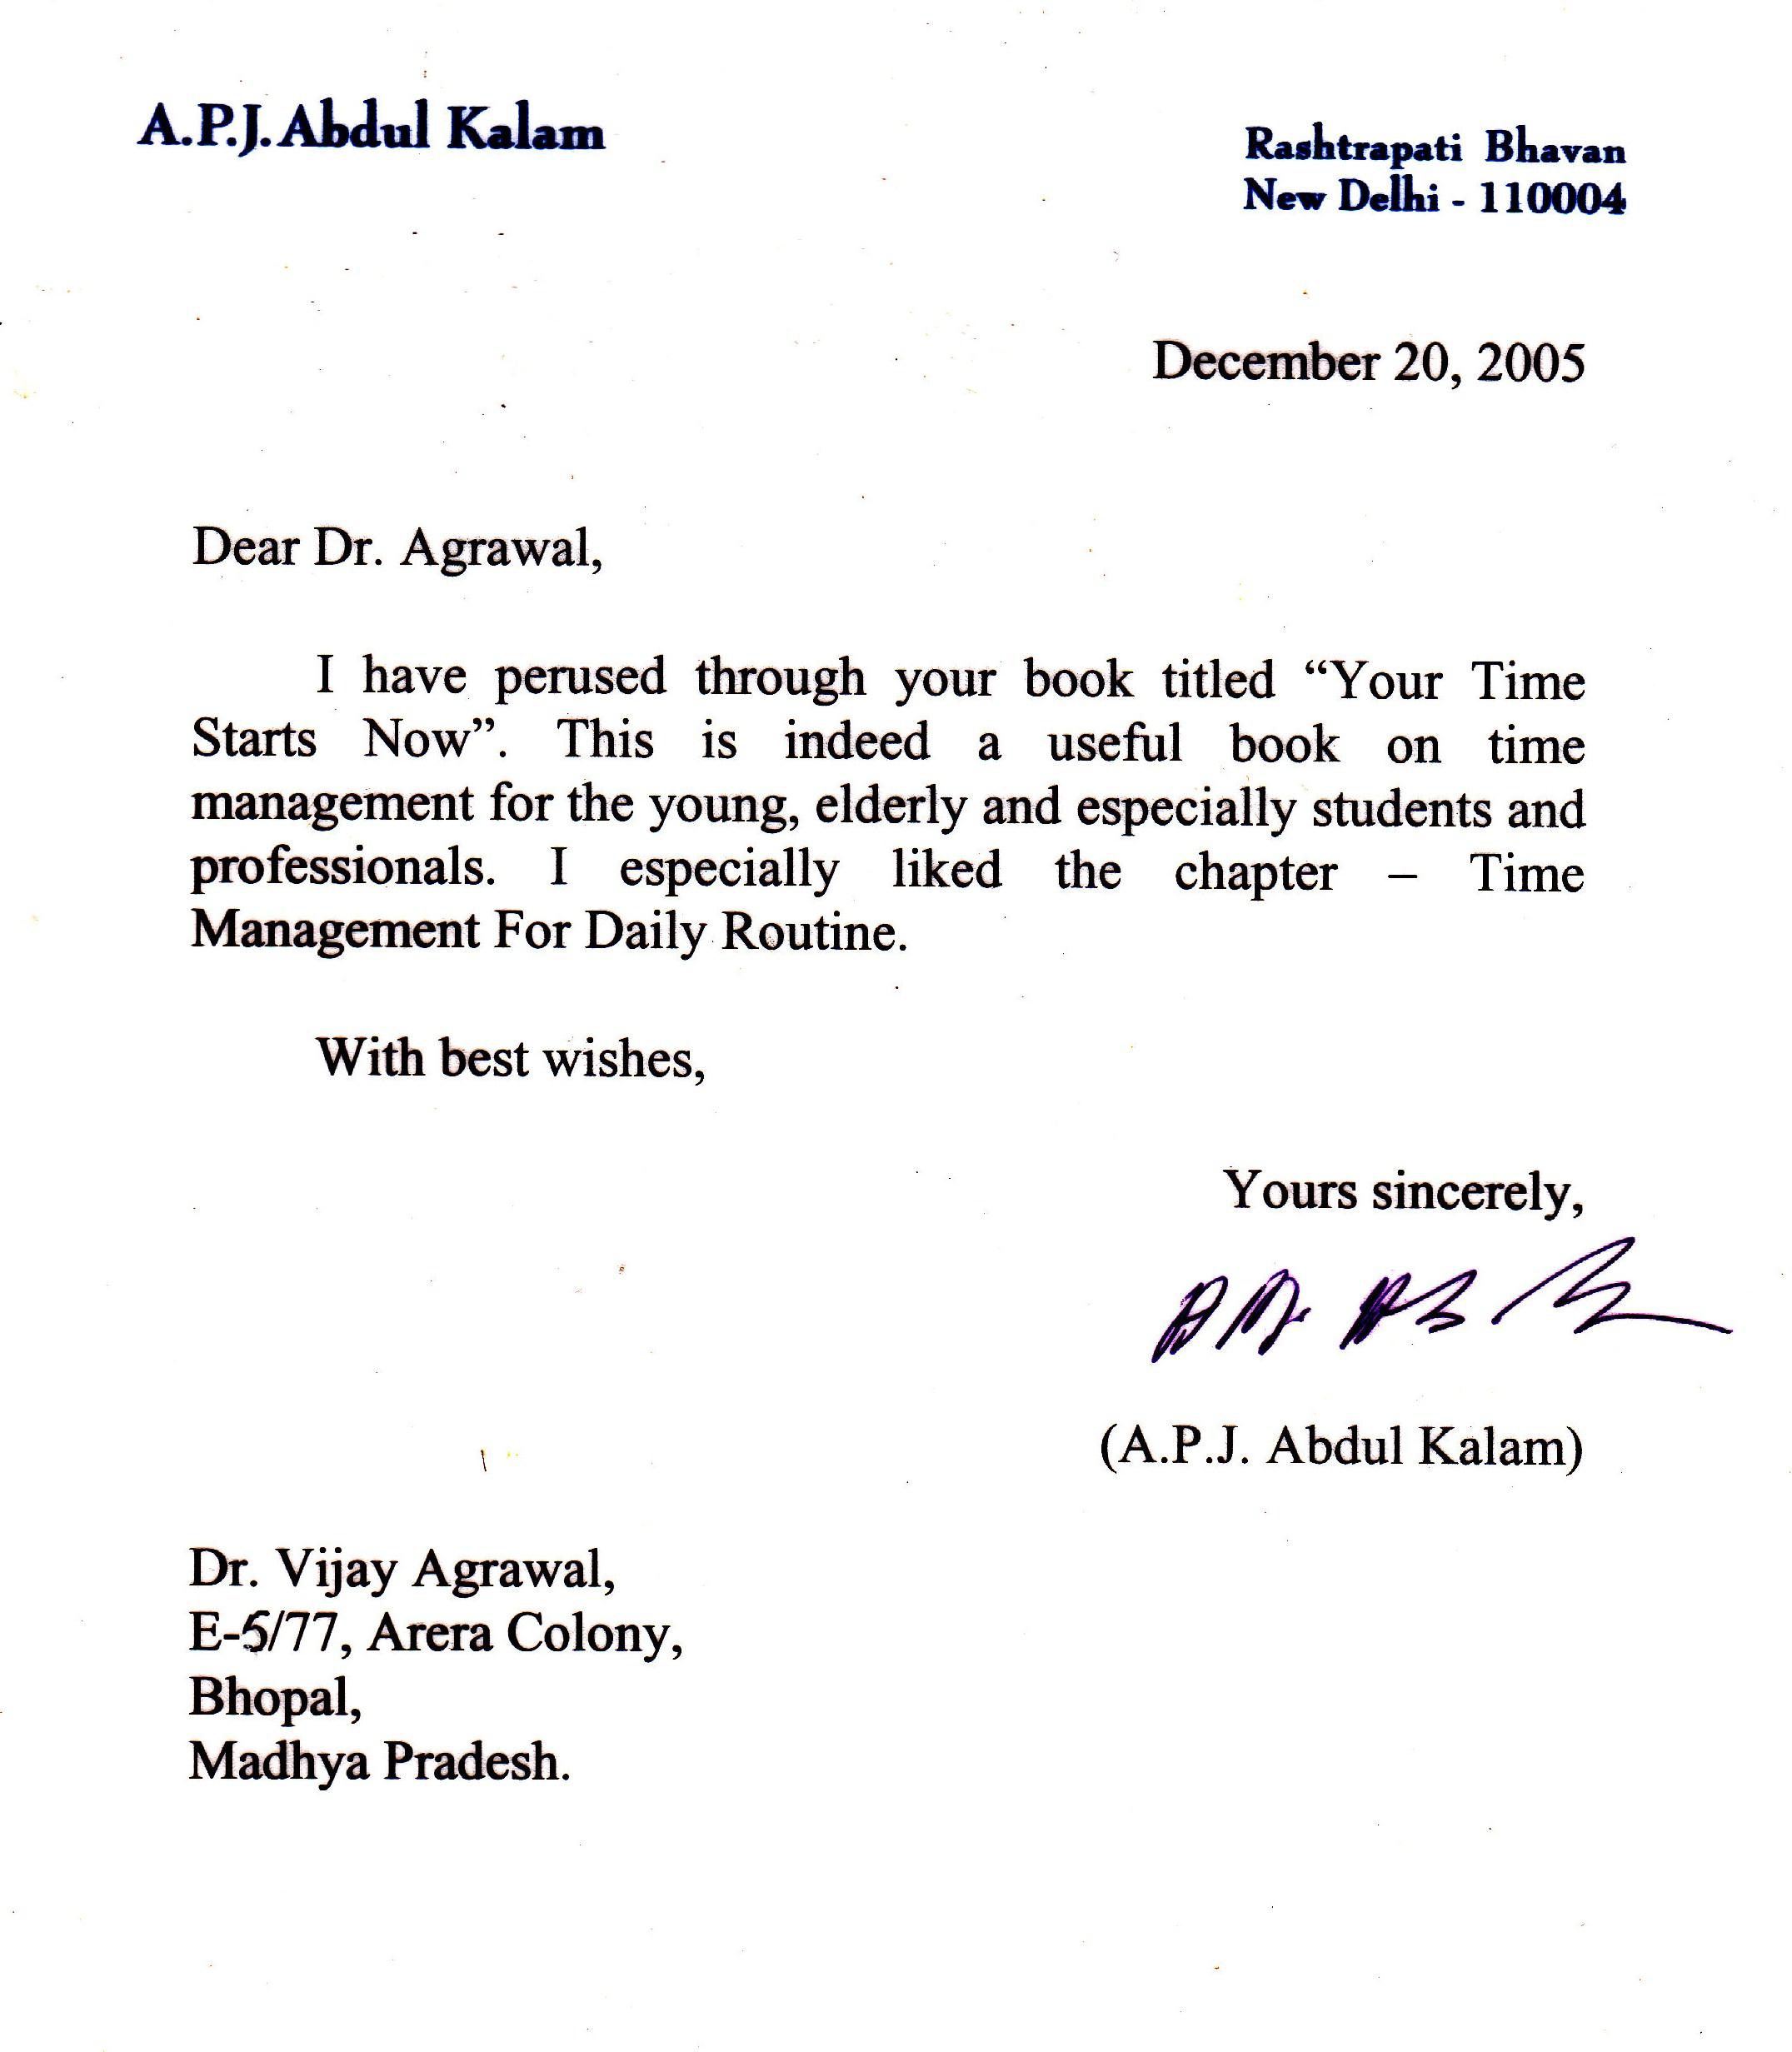 Letter by former President Dr. A.P.J. Abdul Kalam